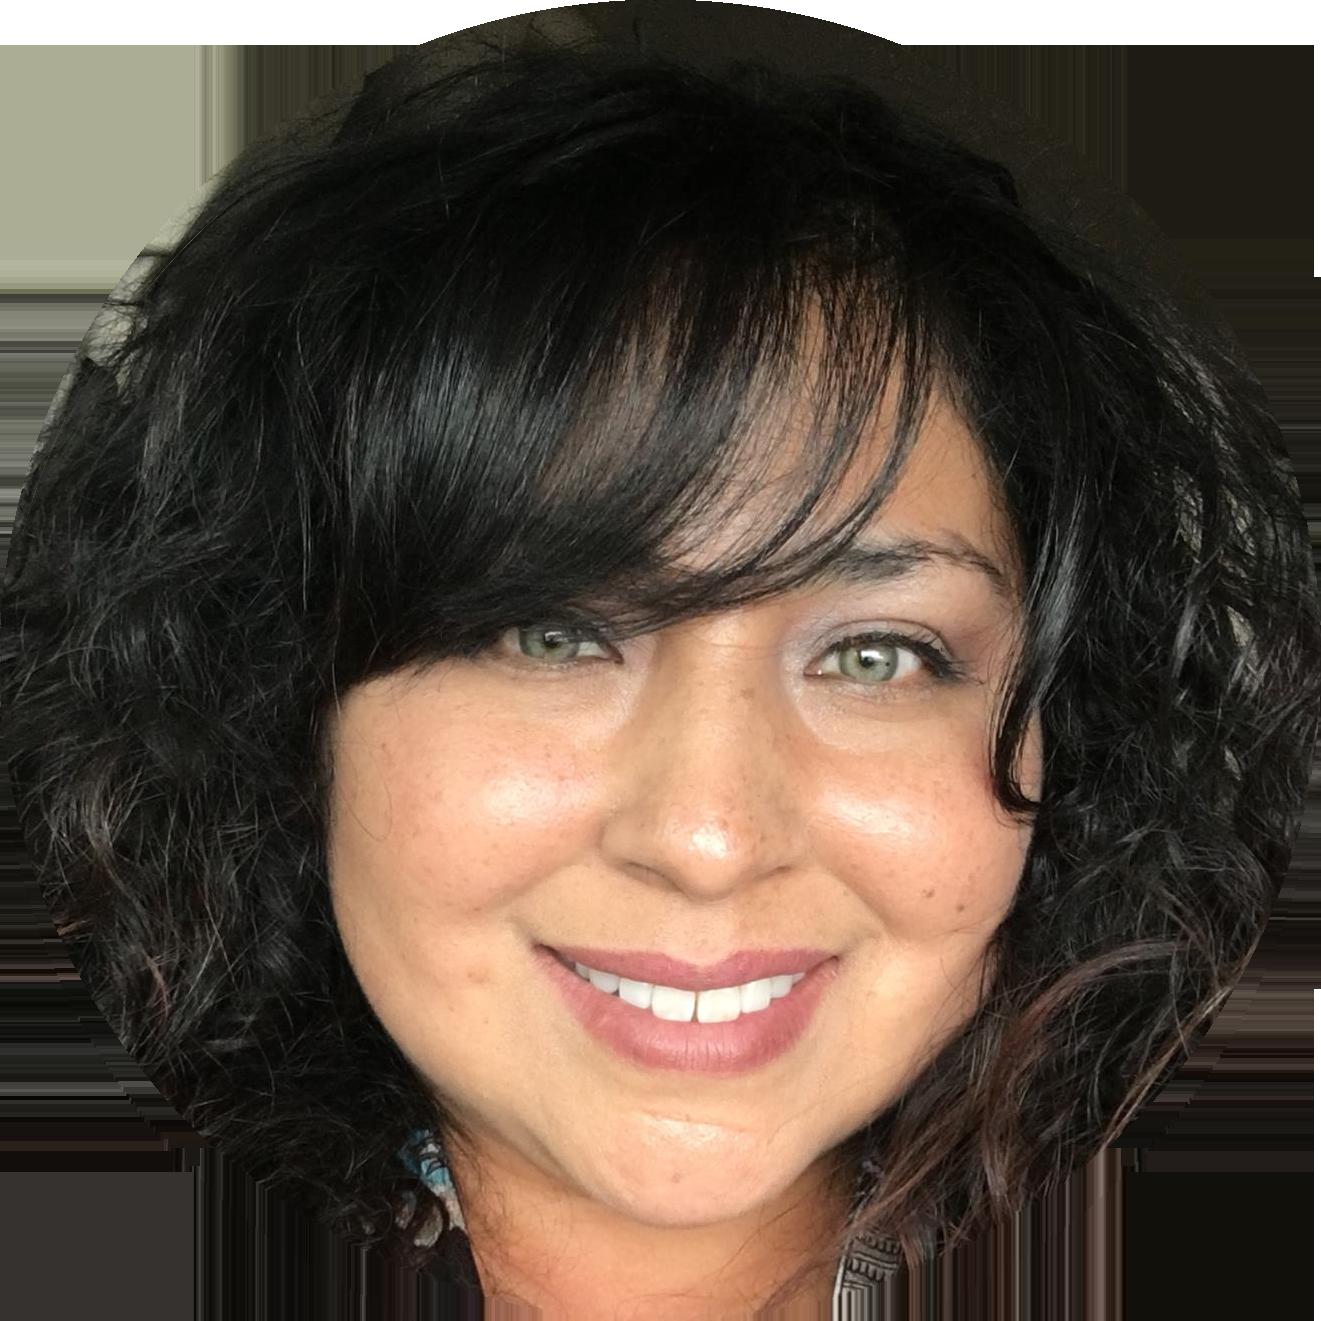 Melissa Rose Bustos